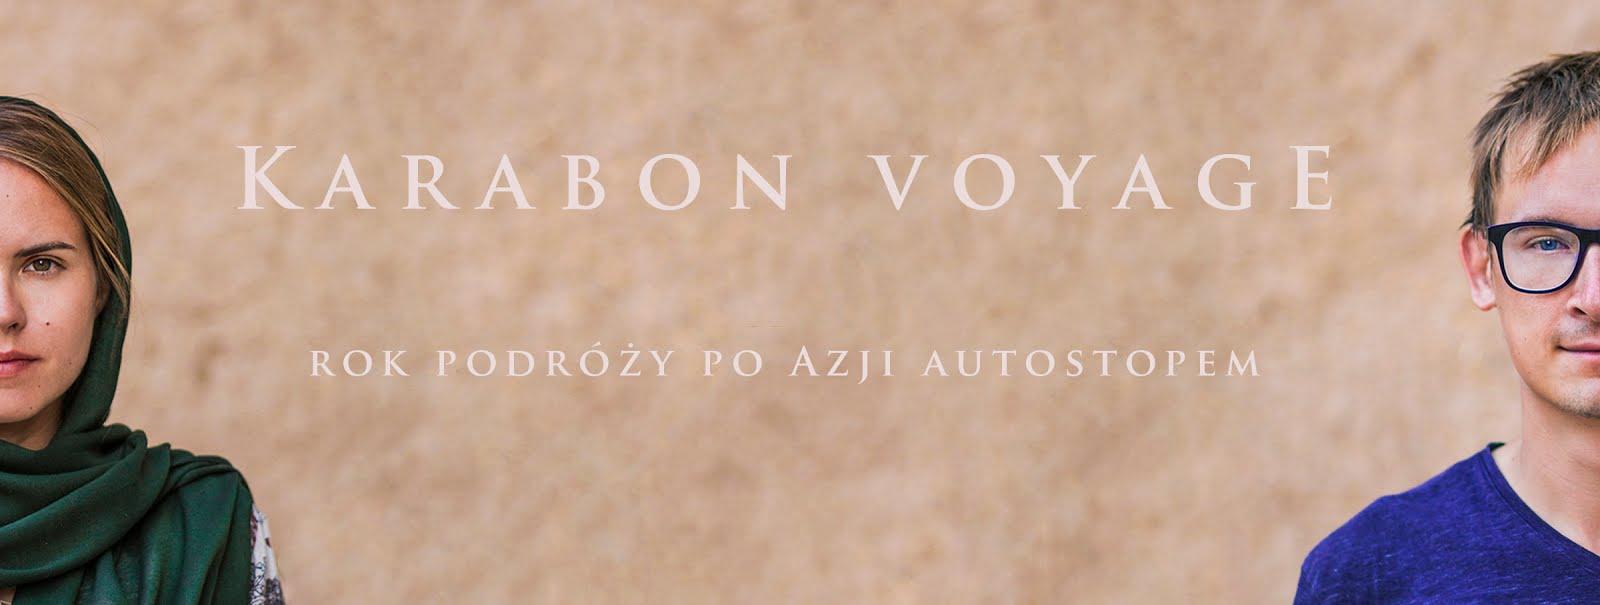 Karabon voyage - historie i porady z podróży